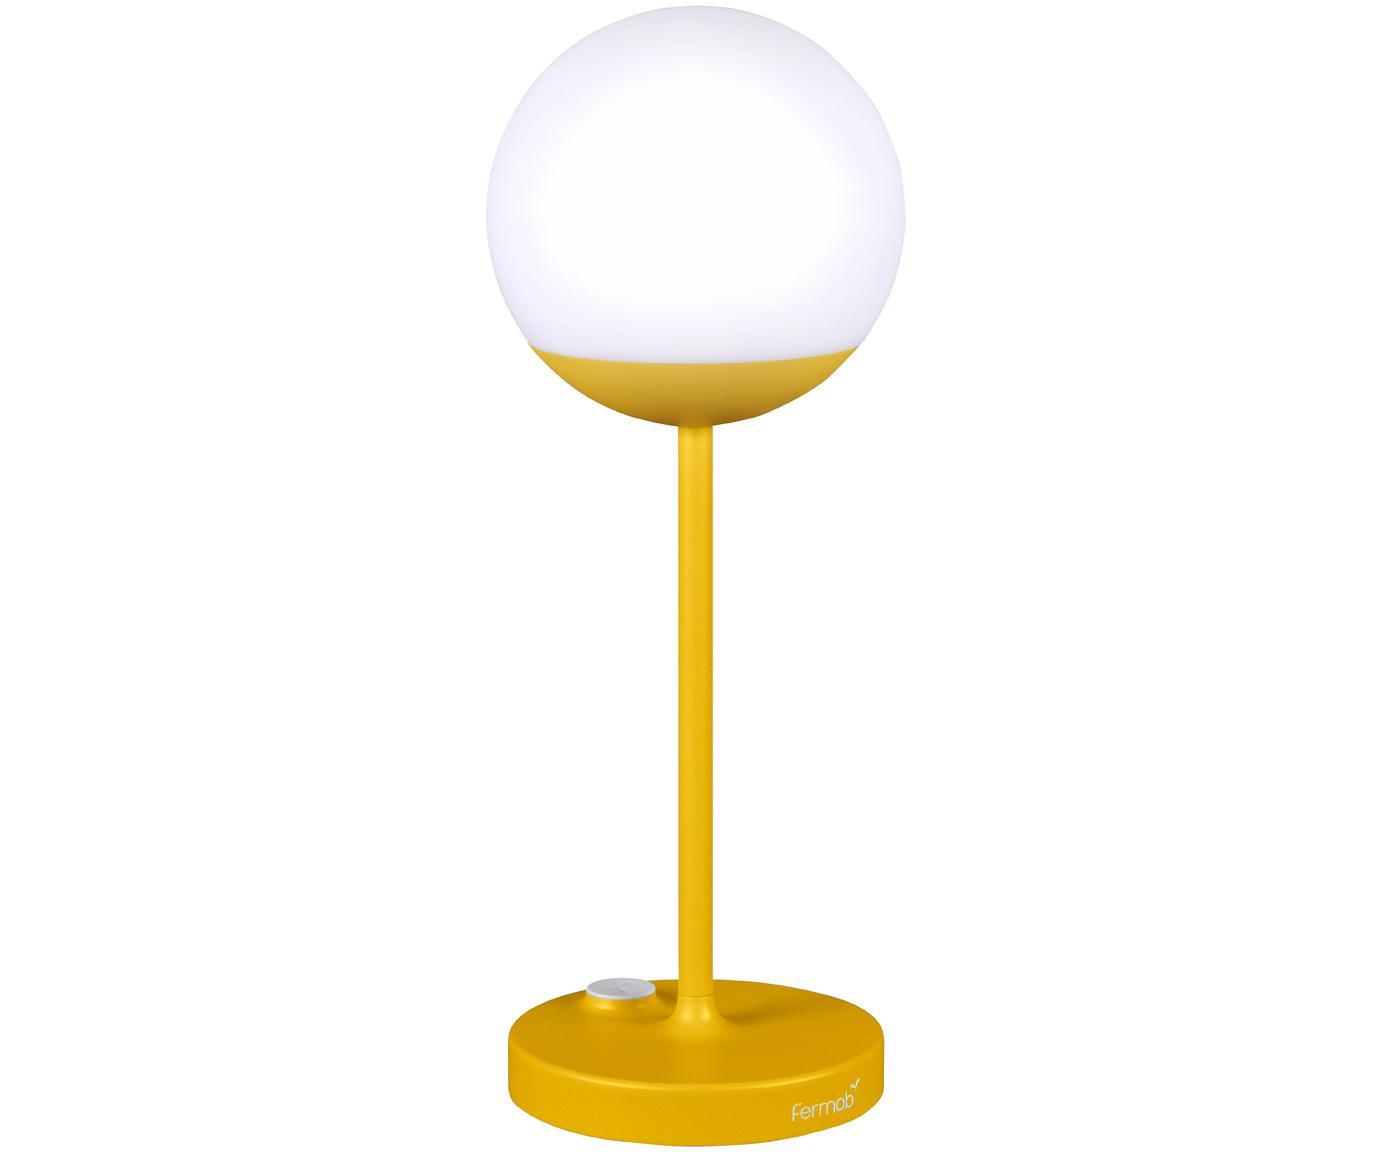 Mobile LED Außenleuchte Mooon, Lampenschirm: Kunststoff, Gelb, Ø 15 x H 41 cm